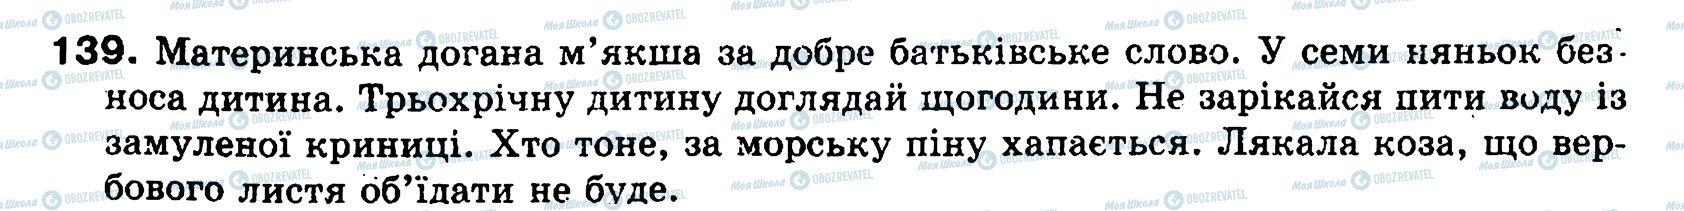 ГДЗ Укр мова 8 класс страница 139